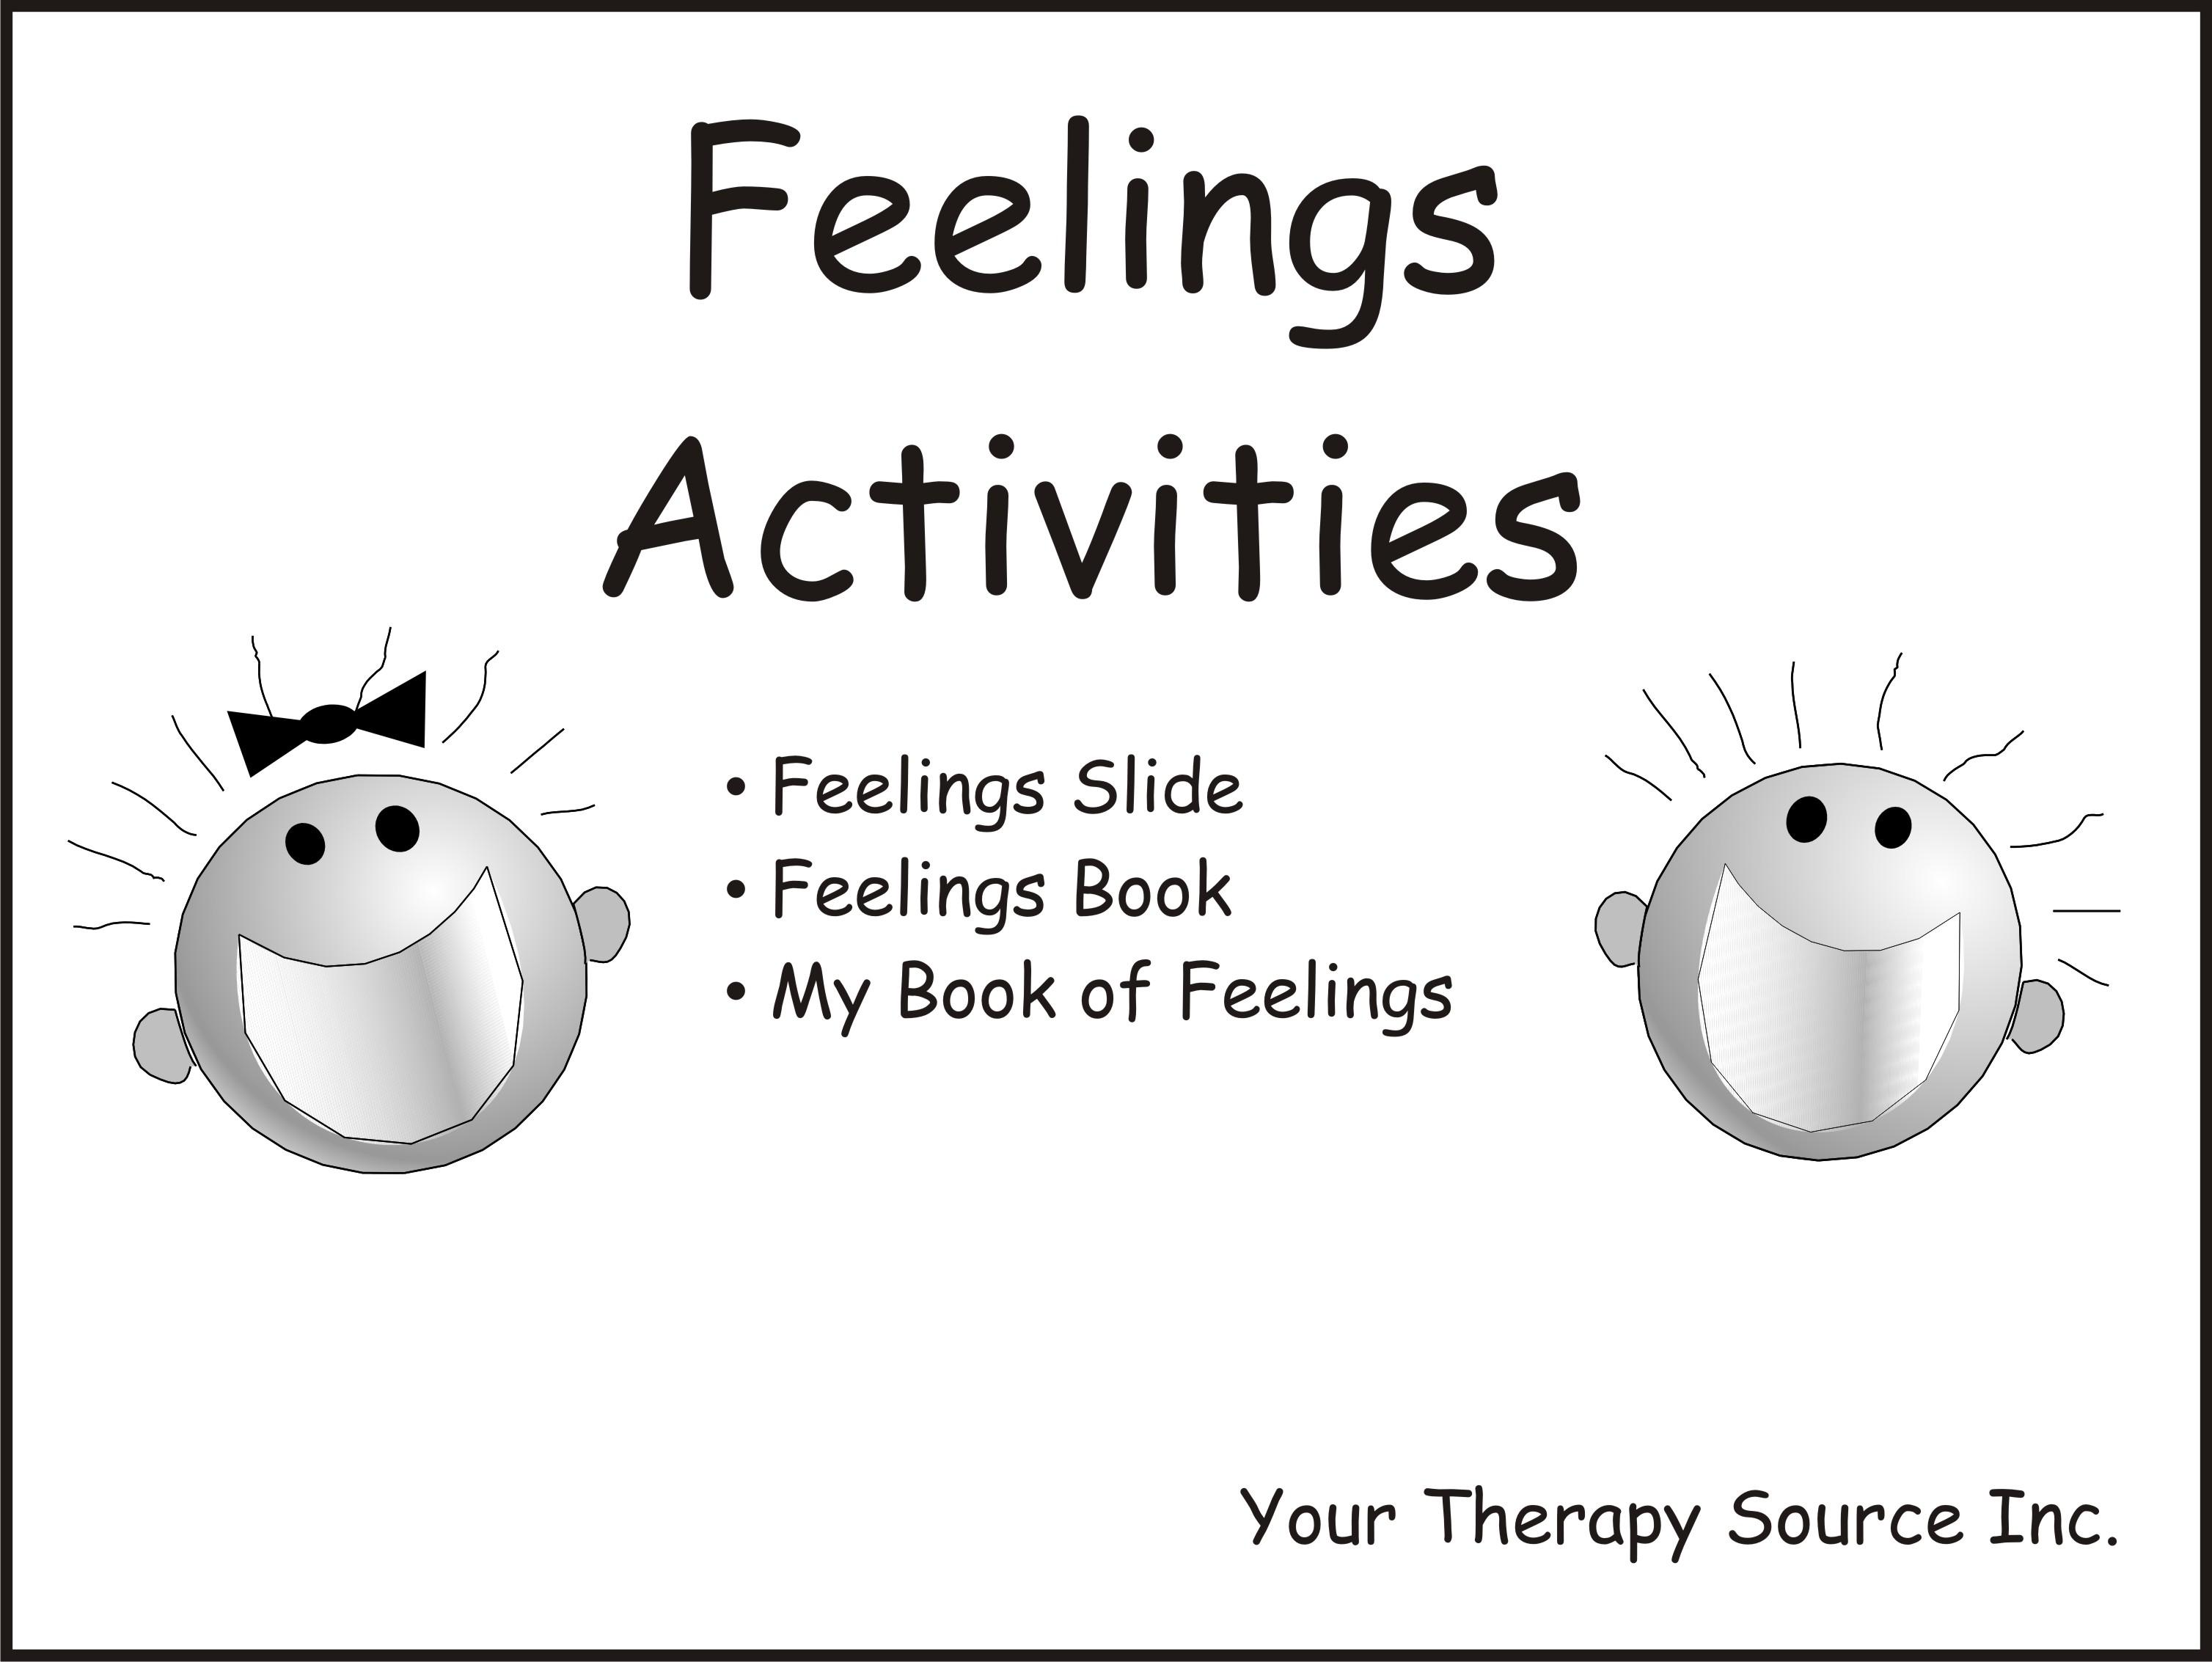 Feelings Activities